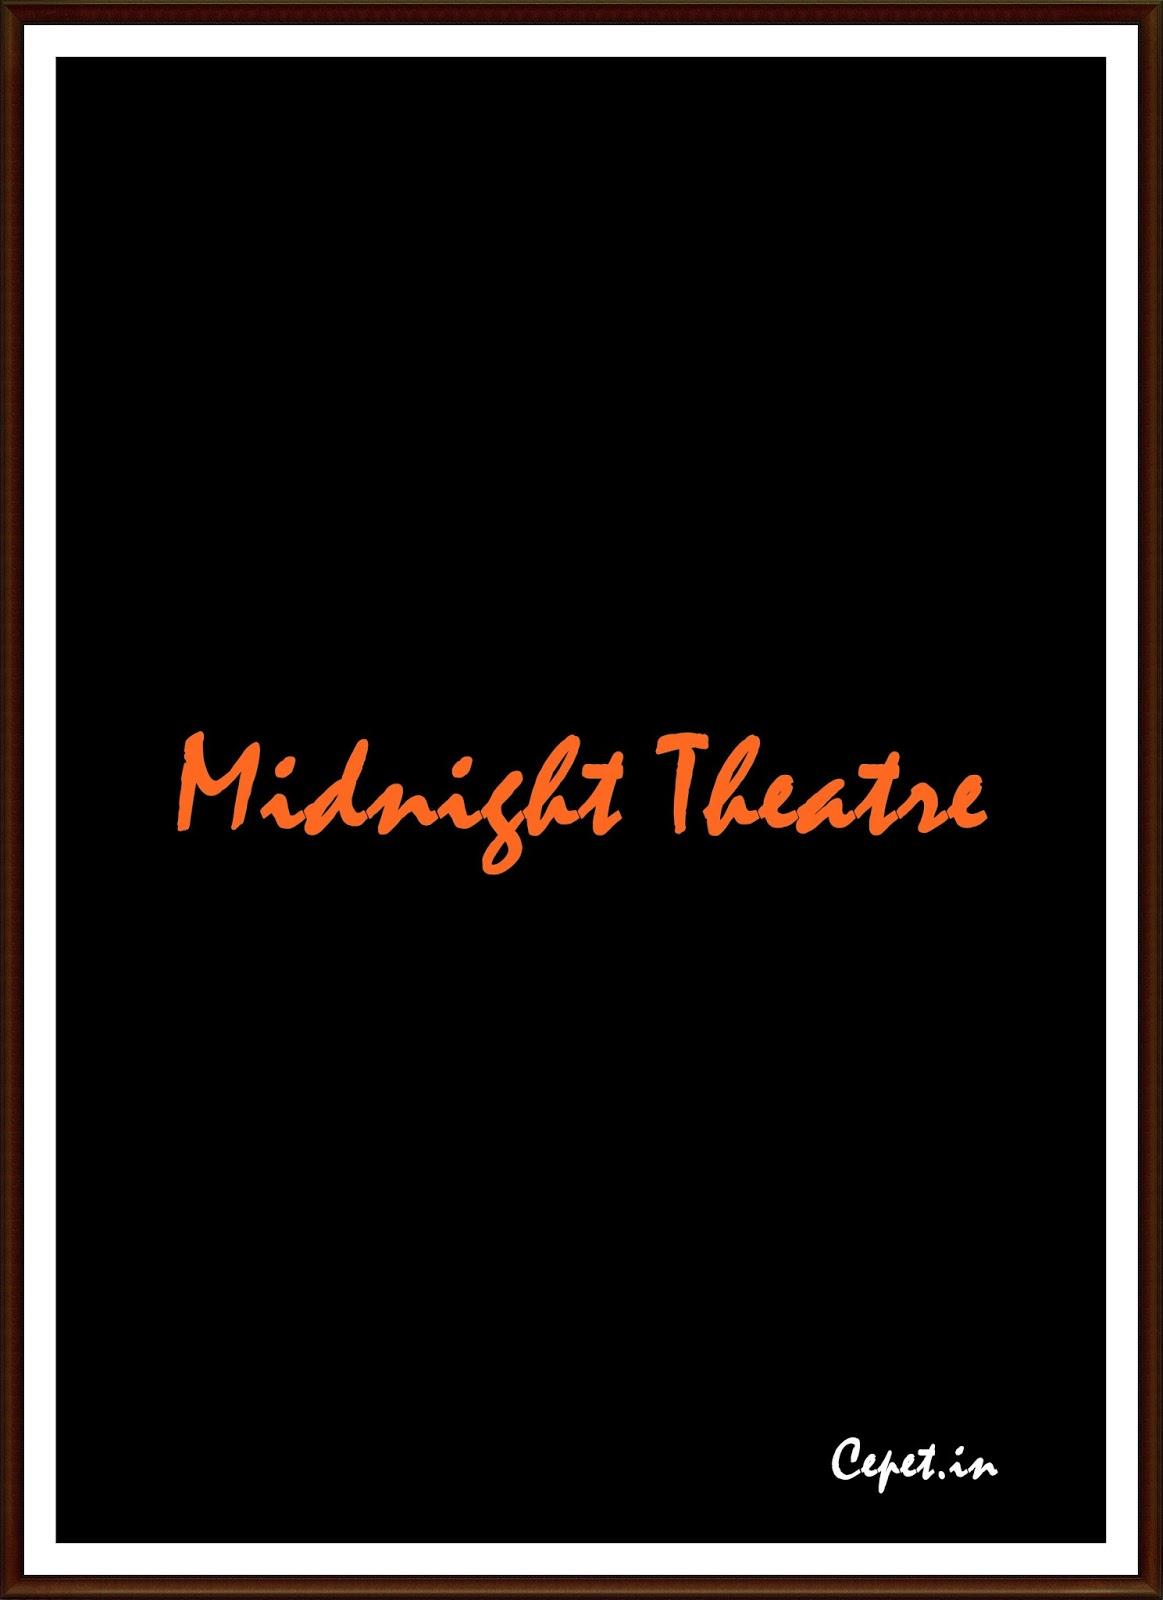 Midnight Theatre (2015) 480p HDRip Cepet.in